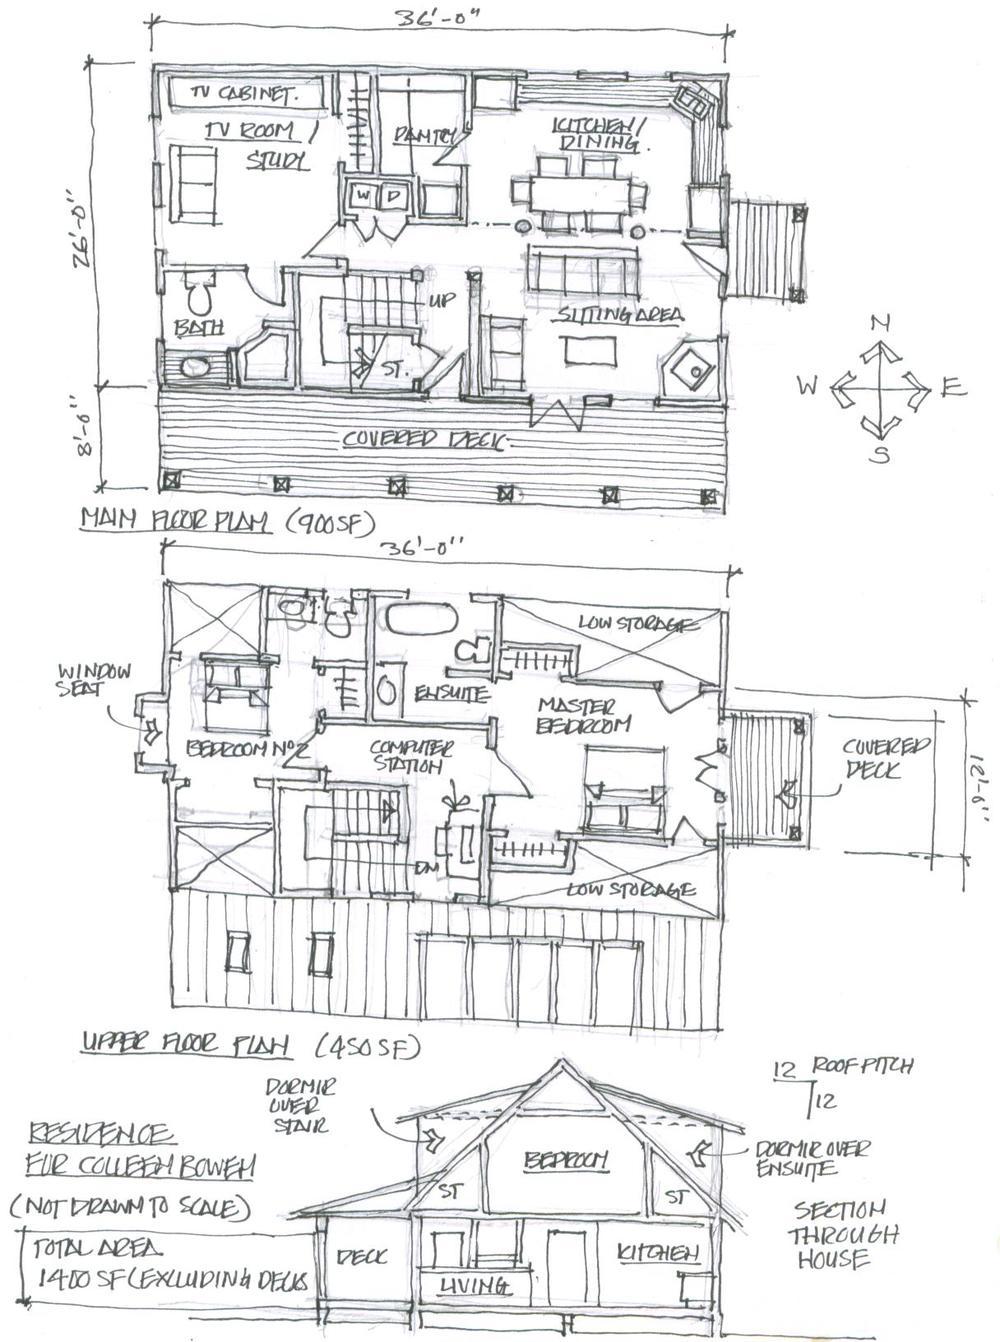 bowen residence concept plans.jpg